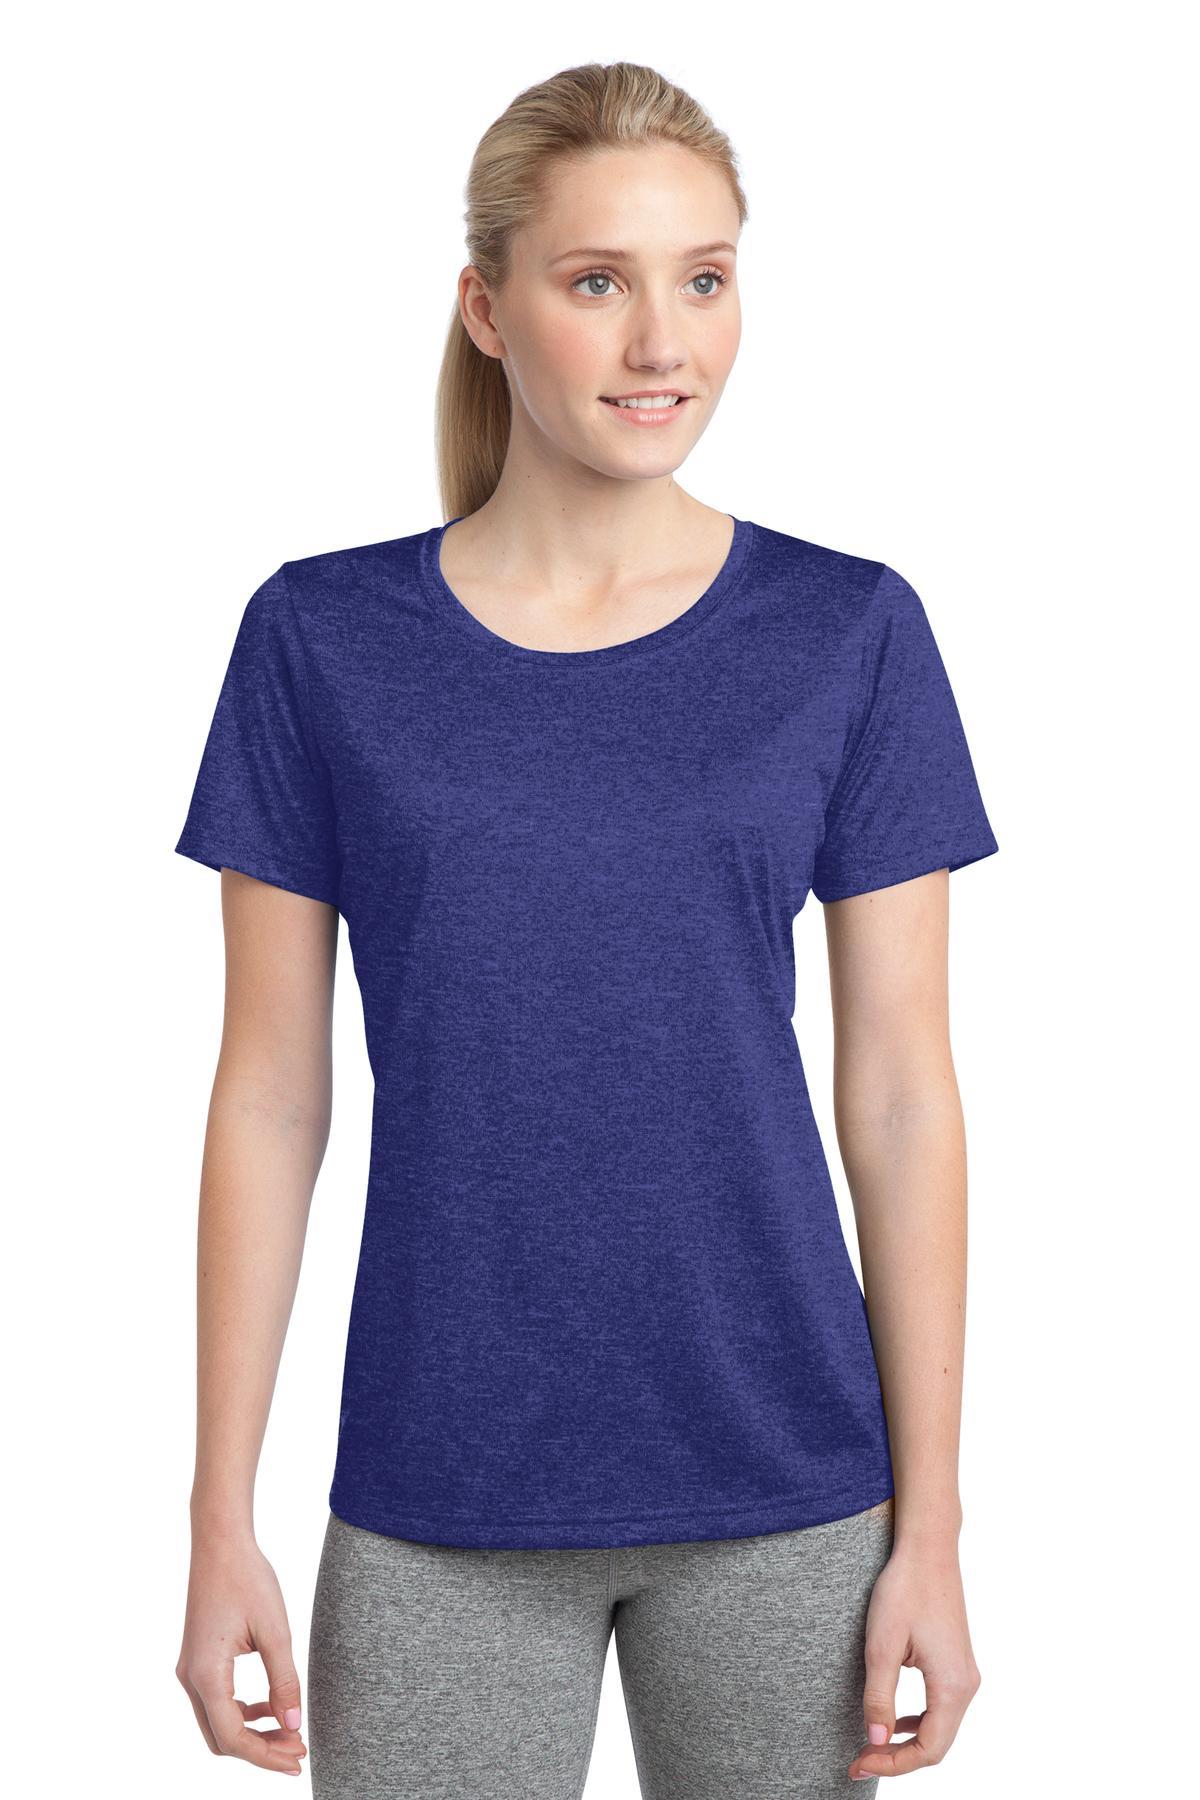 T-Shirts-Performance-17